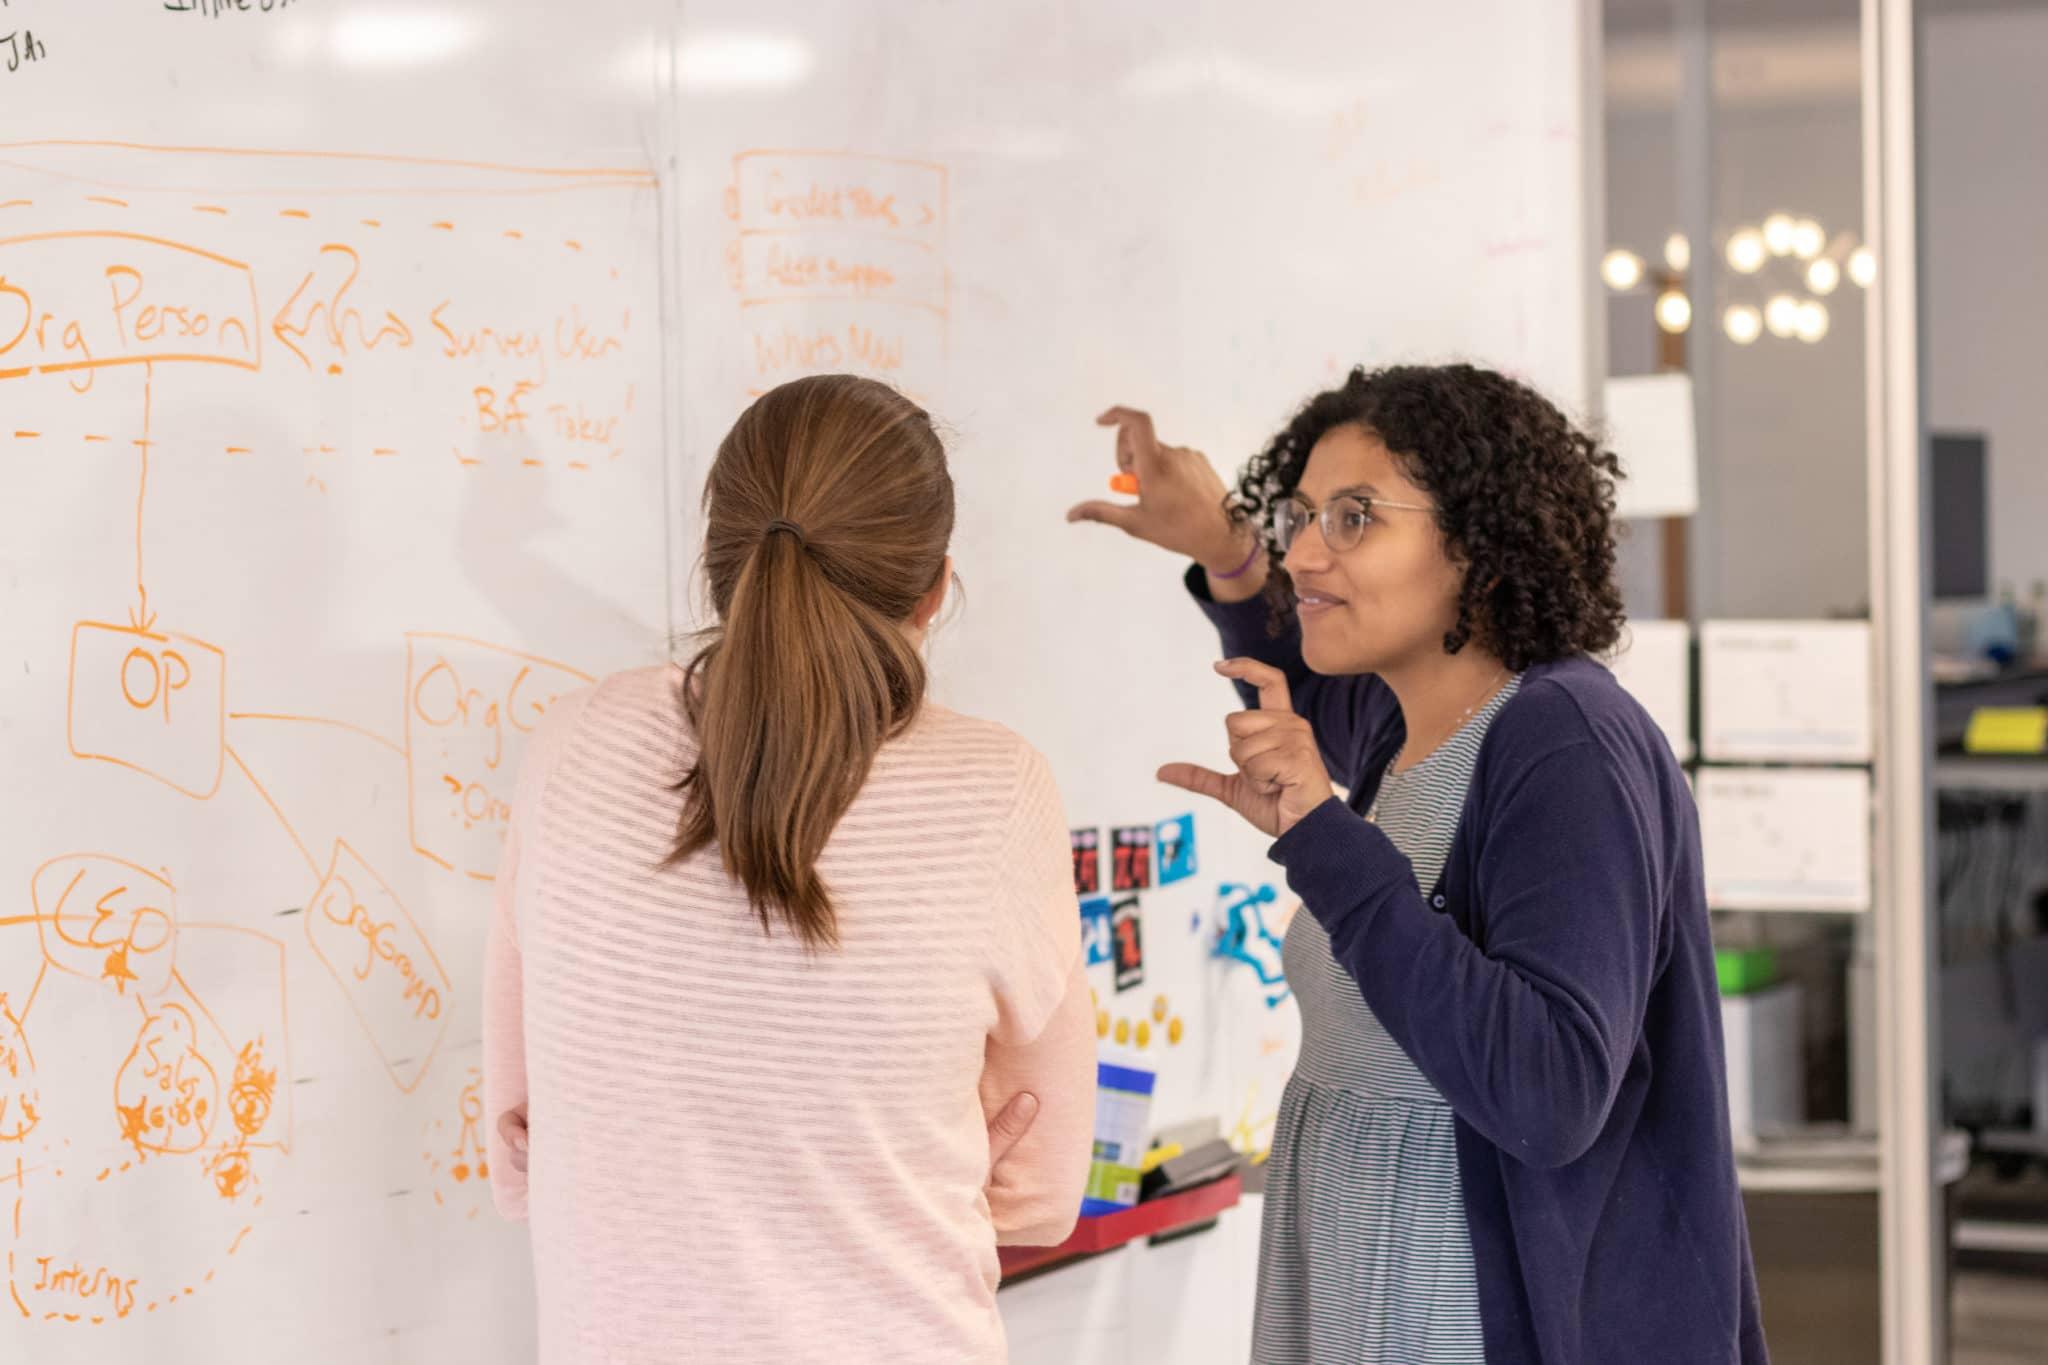 PI employees going through business process improvement